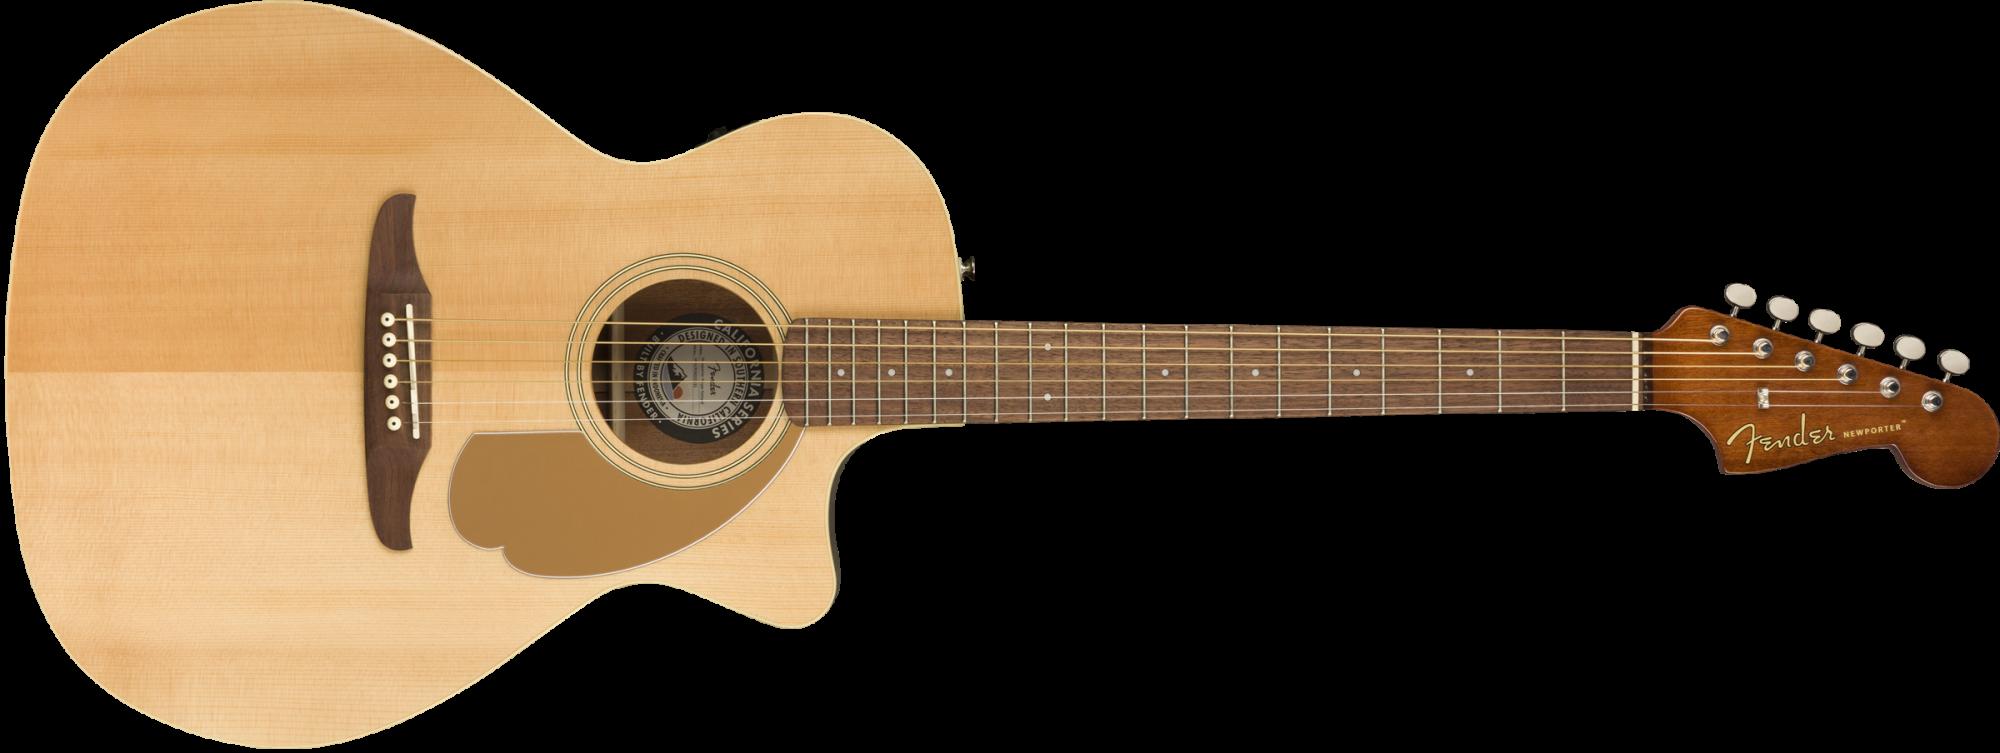 Fender Newporter Player - Walnut Fingerboard - Natural